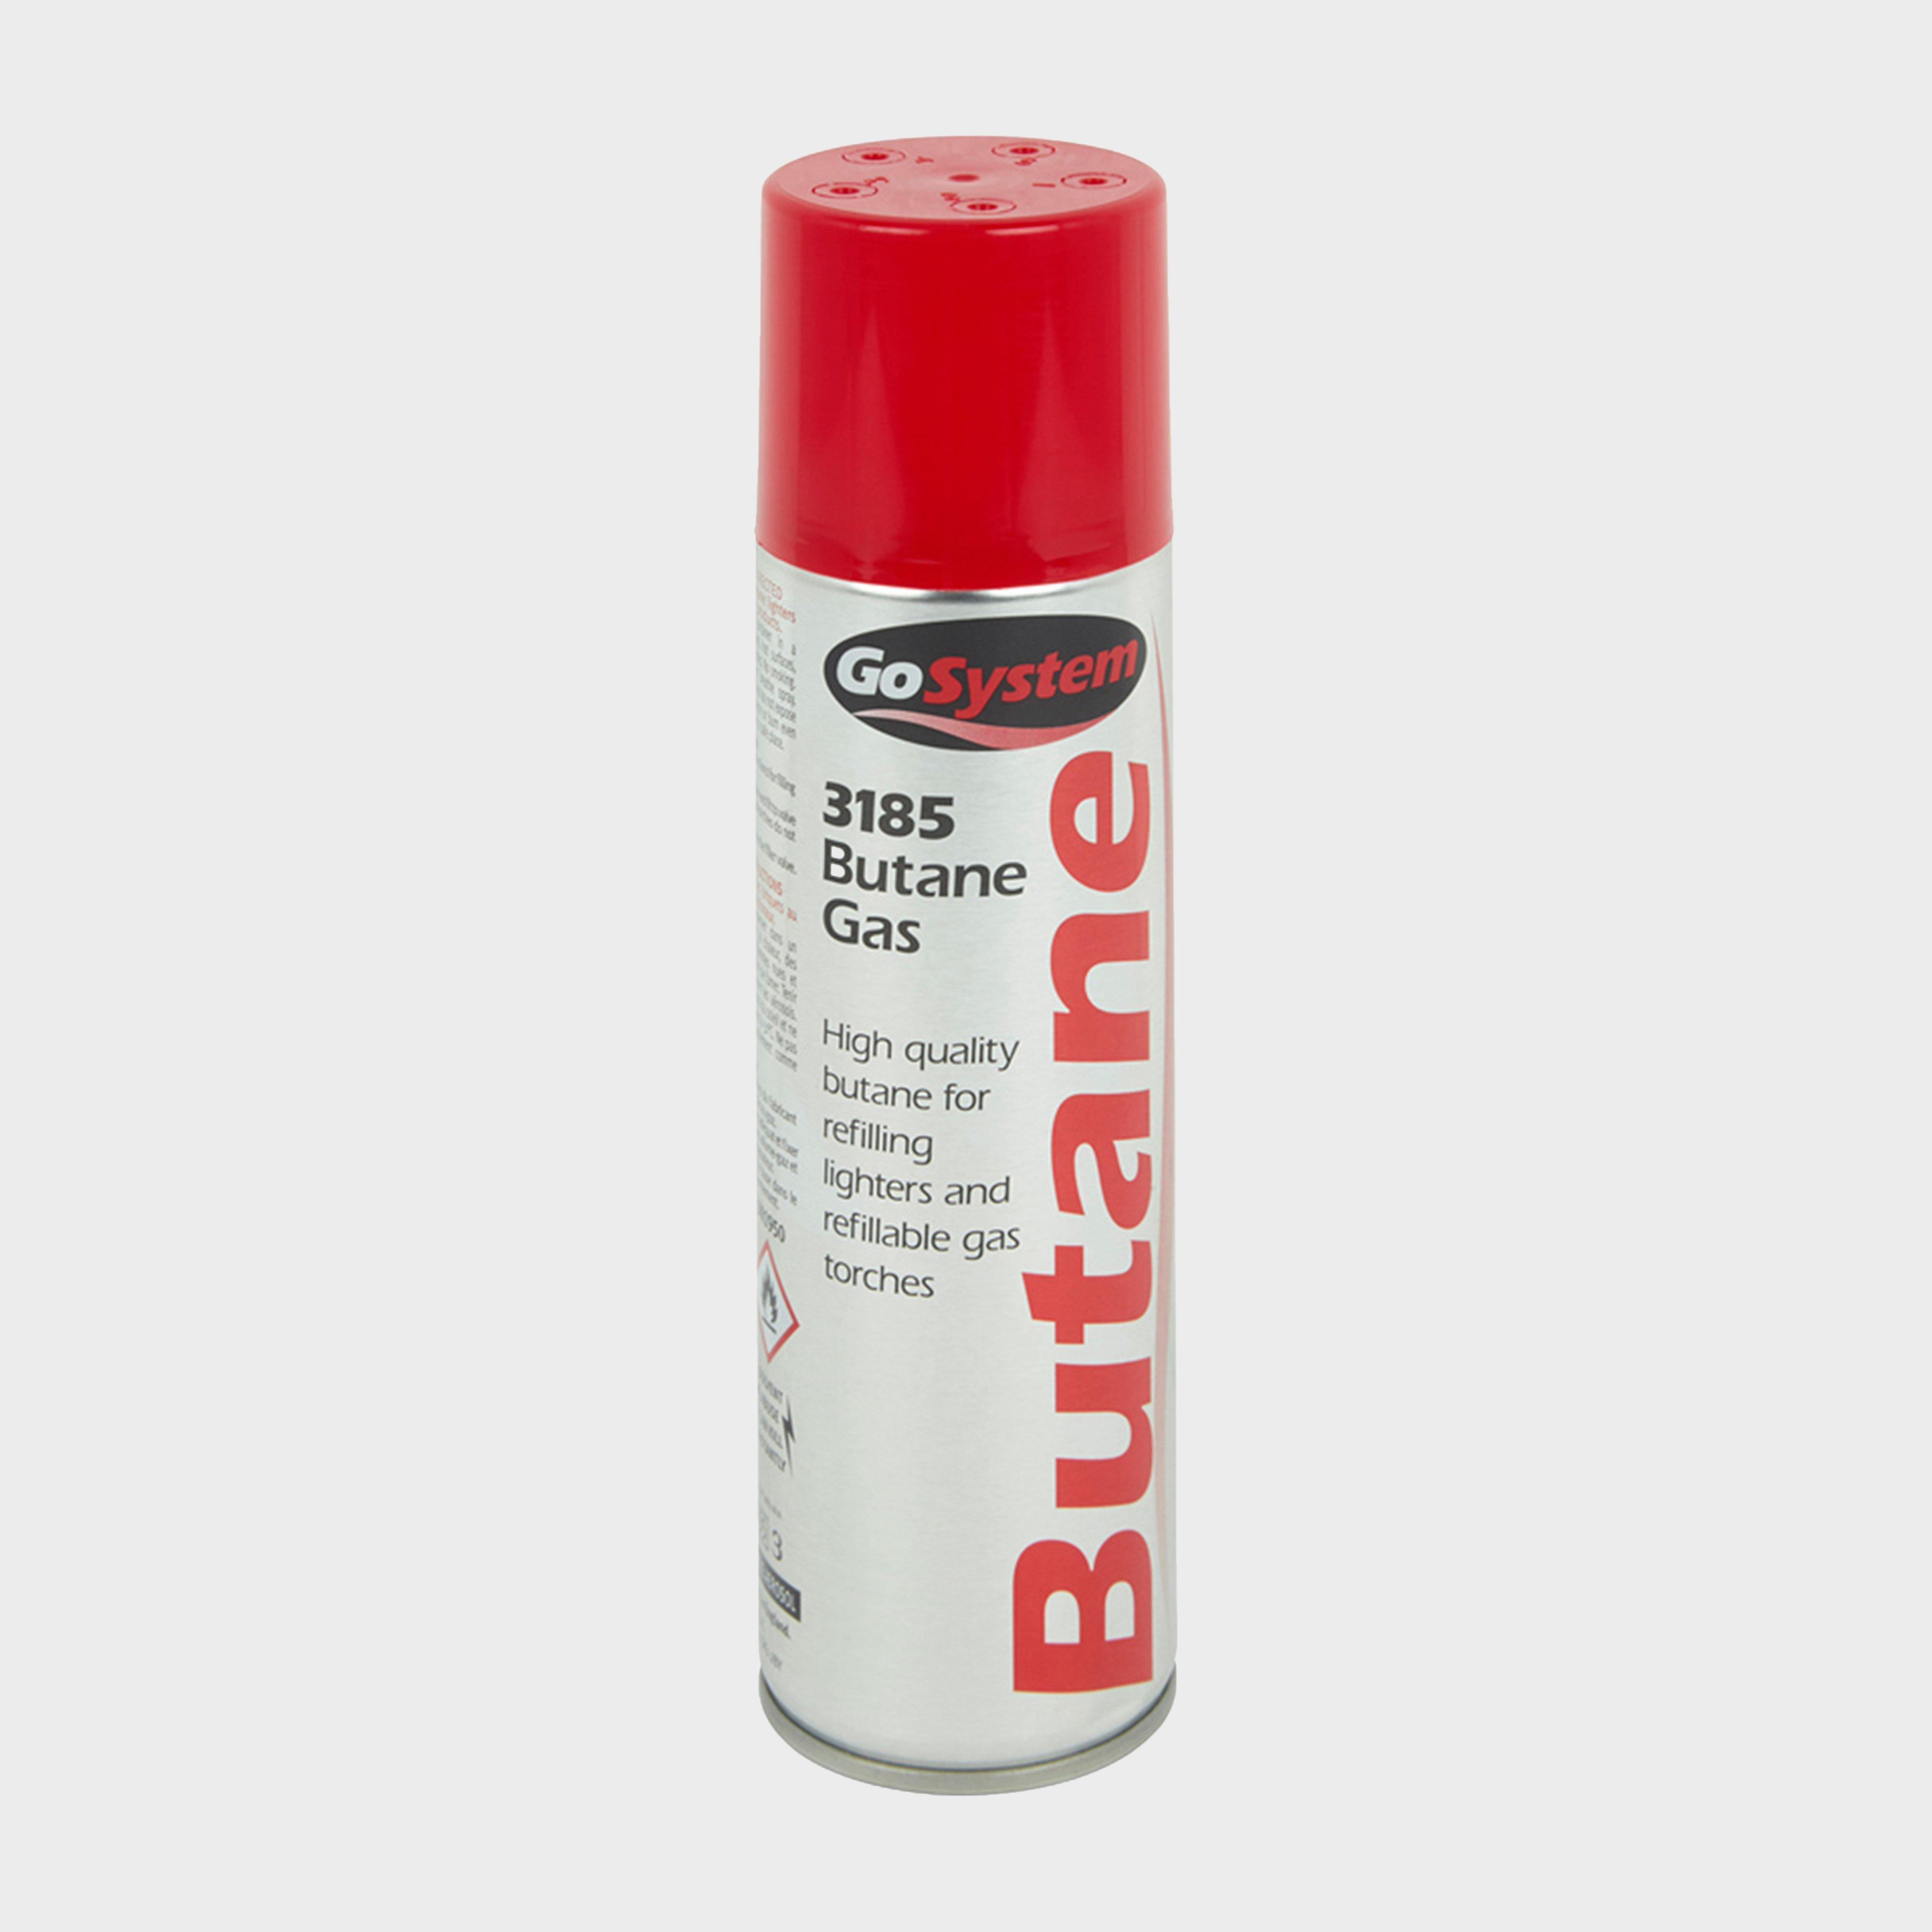 Gogas Butane Gas Lighter Fuel (144g) - White/cartridge  White/cartridge